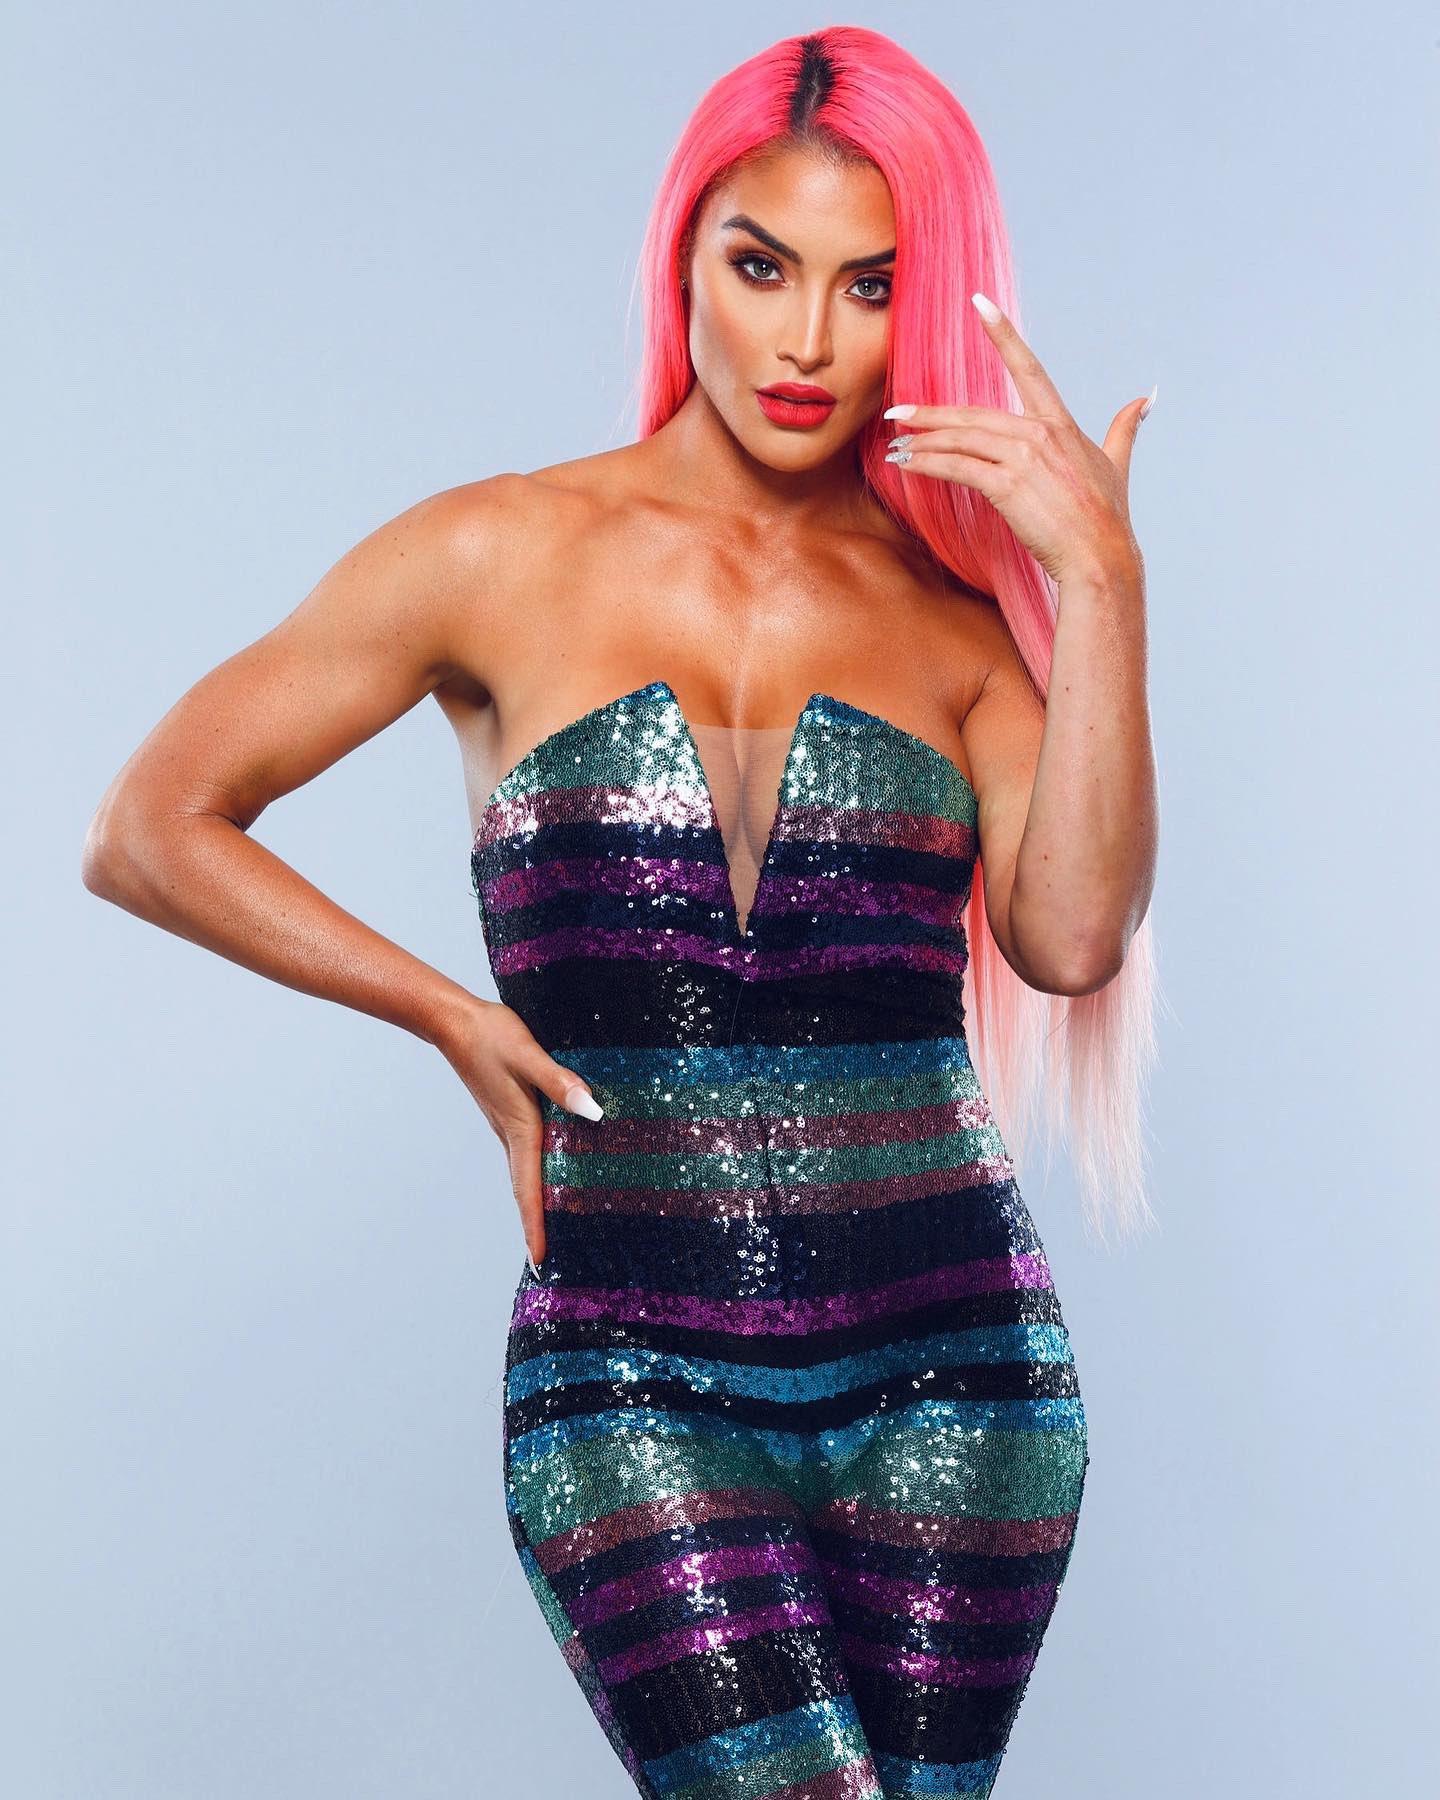 WWE Star Eva Marie Shares New Glittering Pink Power Photos 127